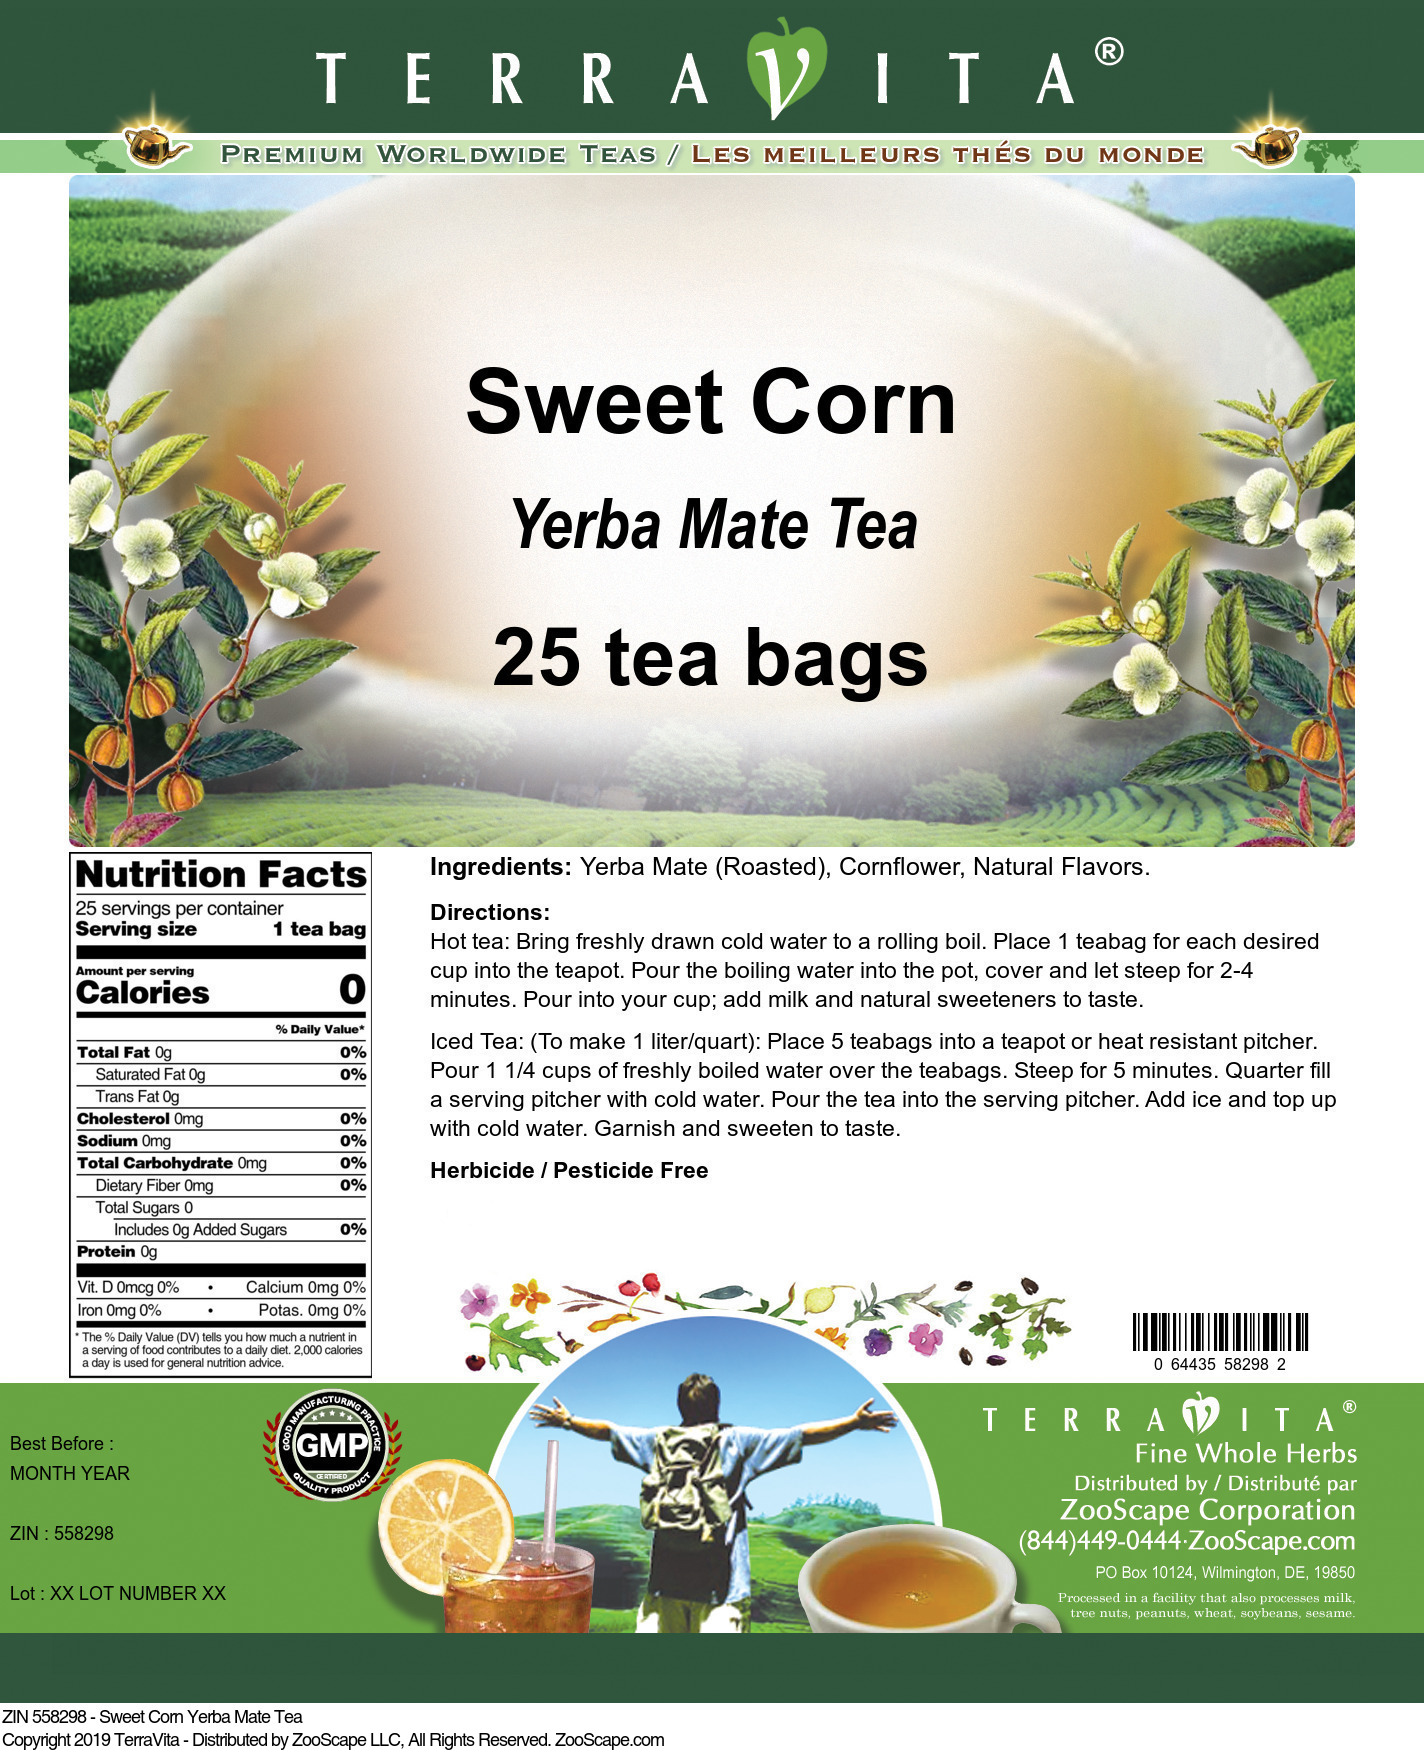 Sweet Corn Yerba Mate